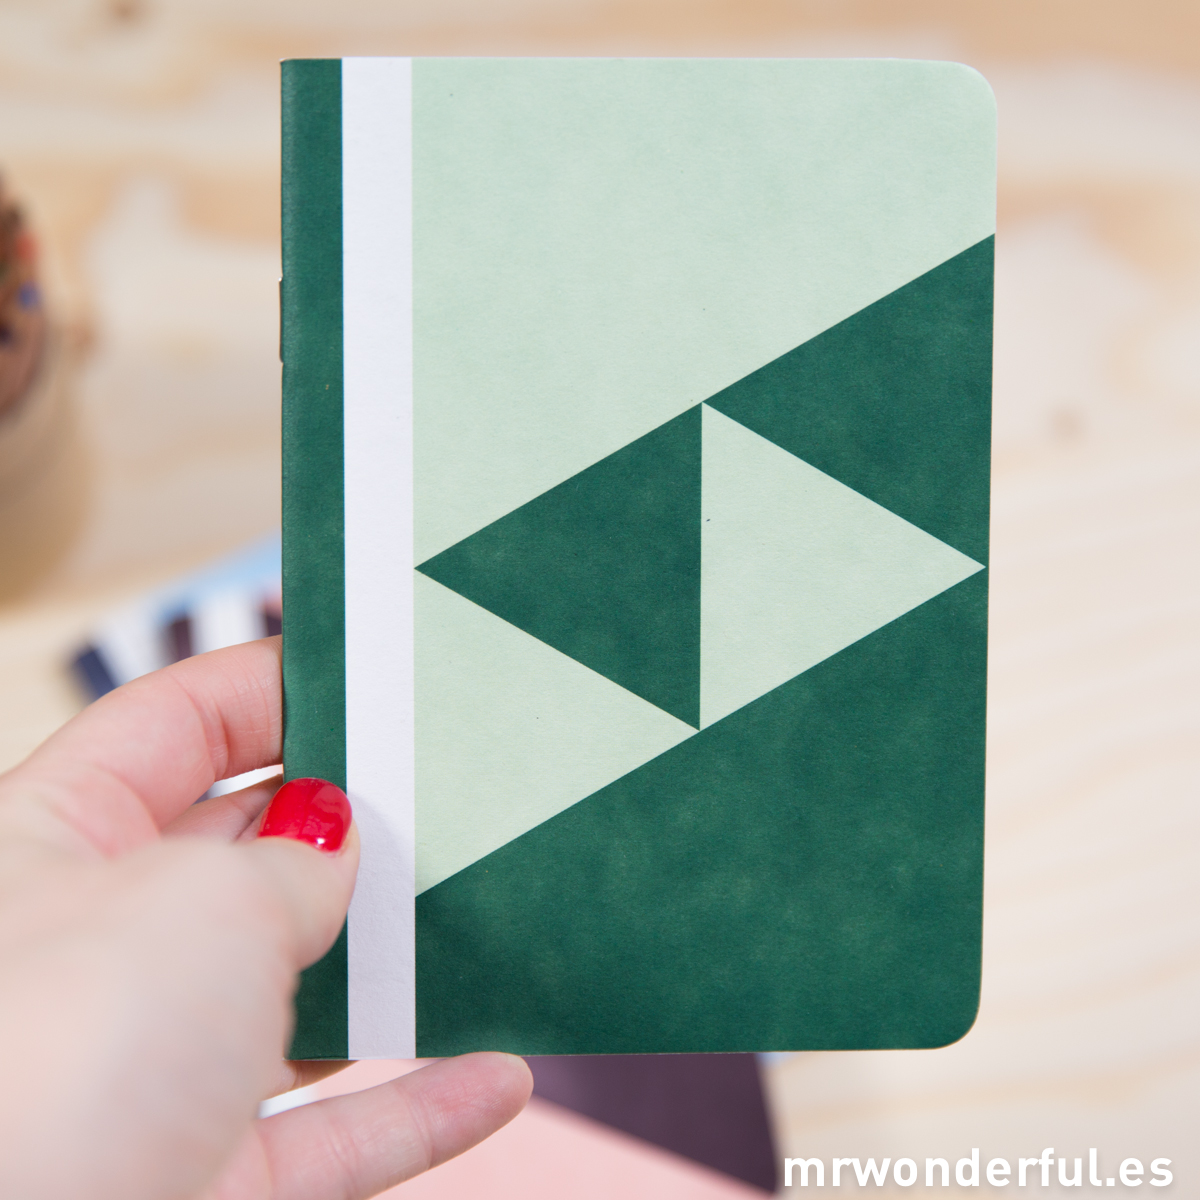 mrwonderful_PNB17_set-3-libretas-bolsillo-rayas-diagonal-4